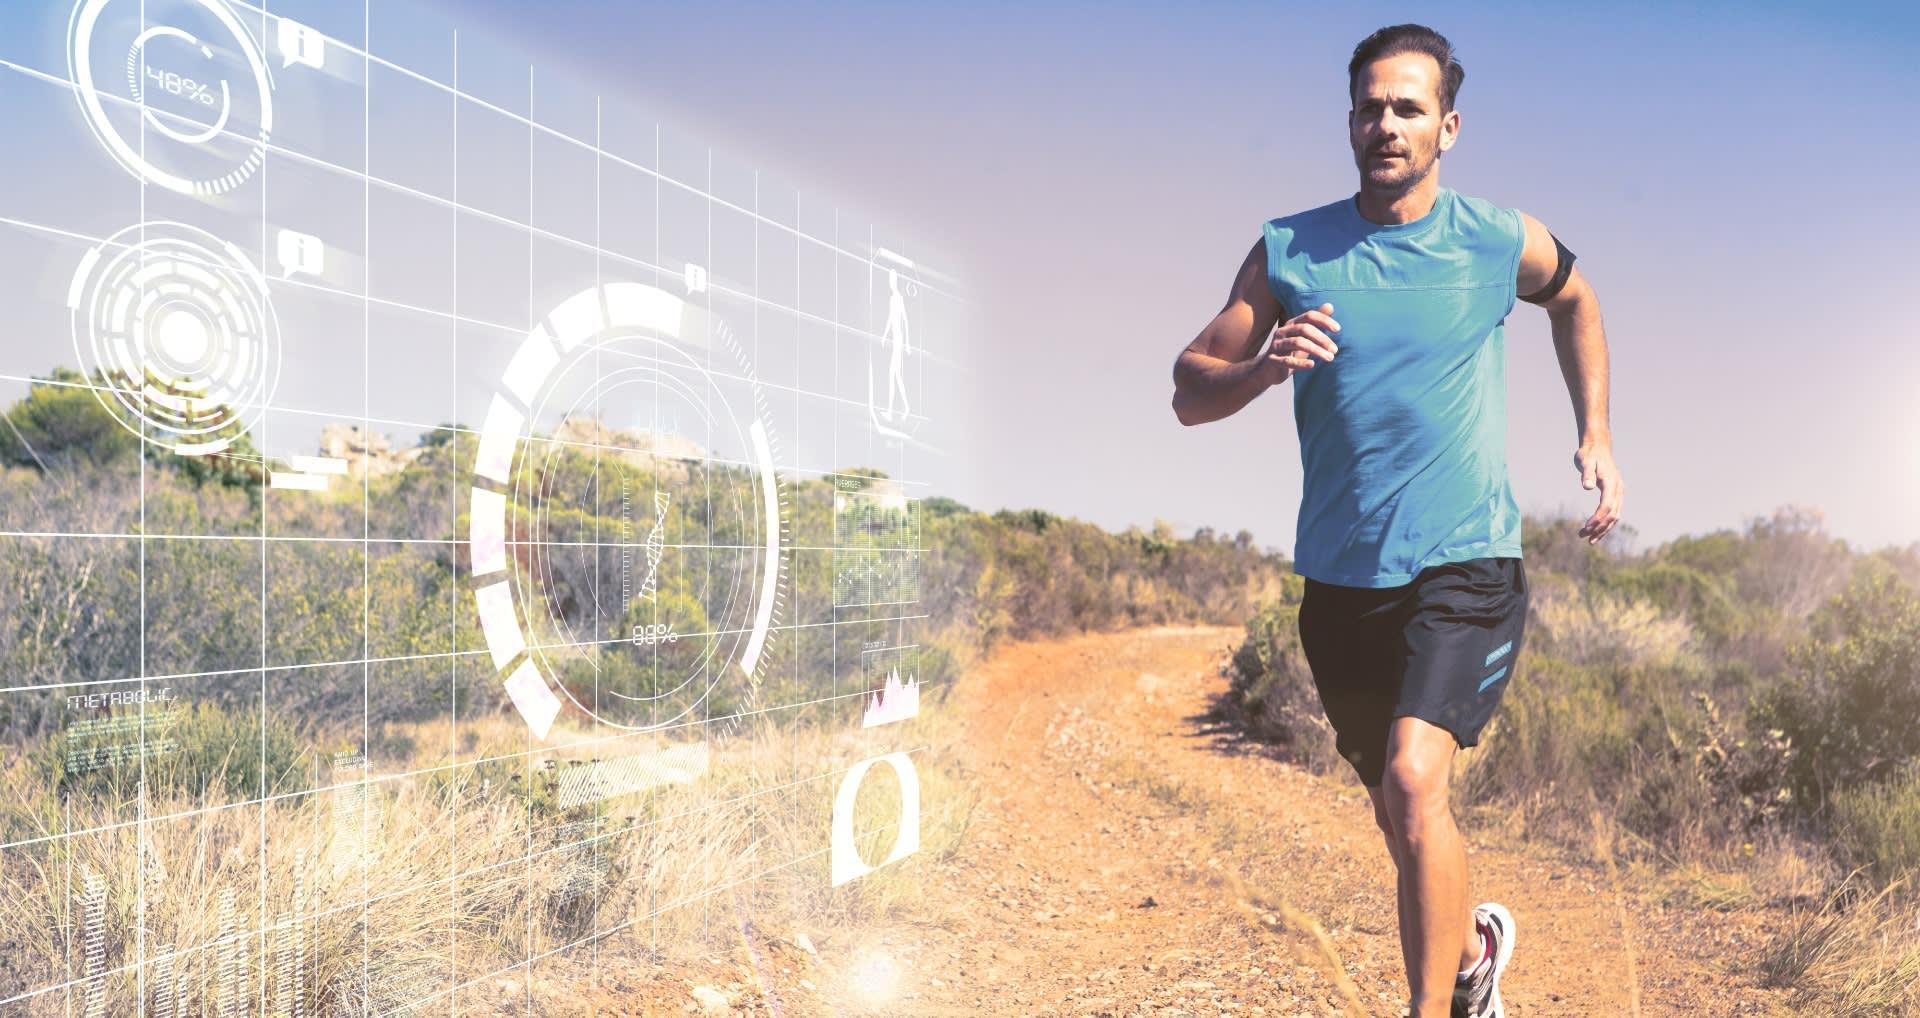 man-running-analytics-banner